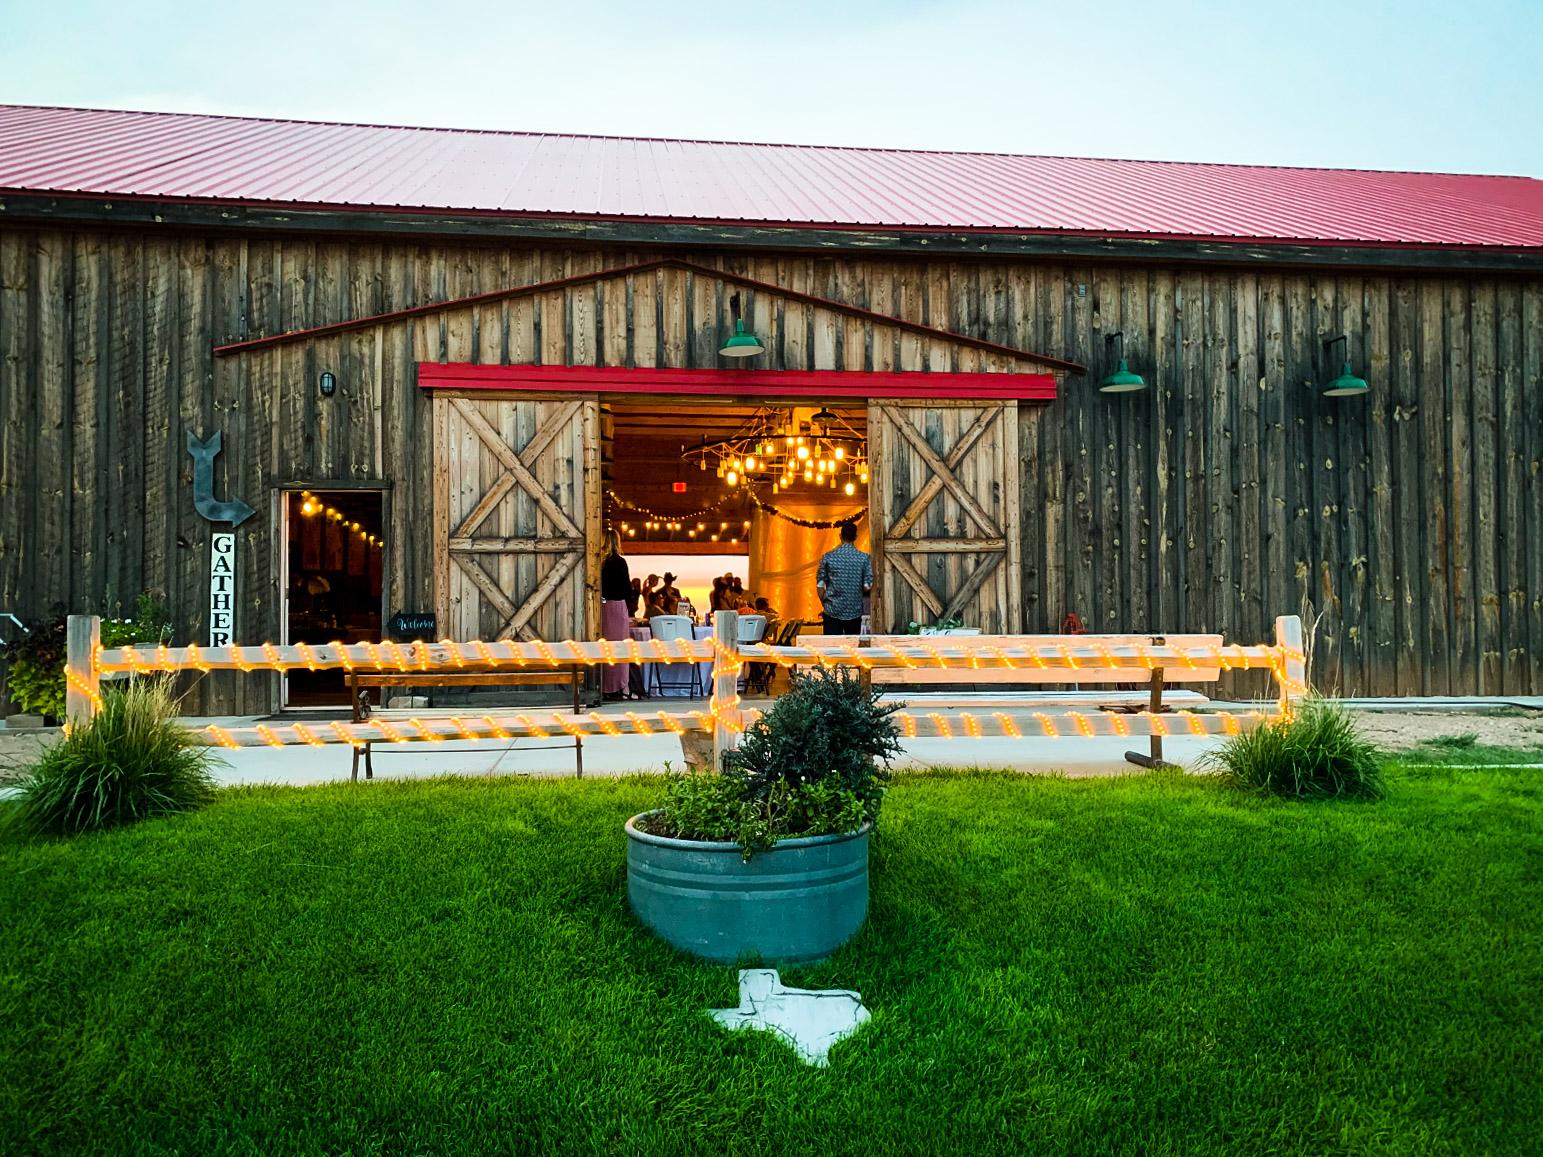 Front doors of the barn